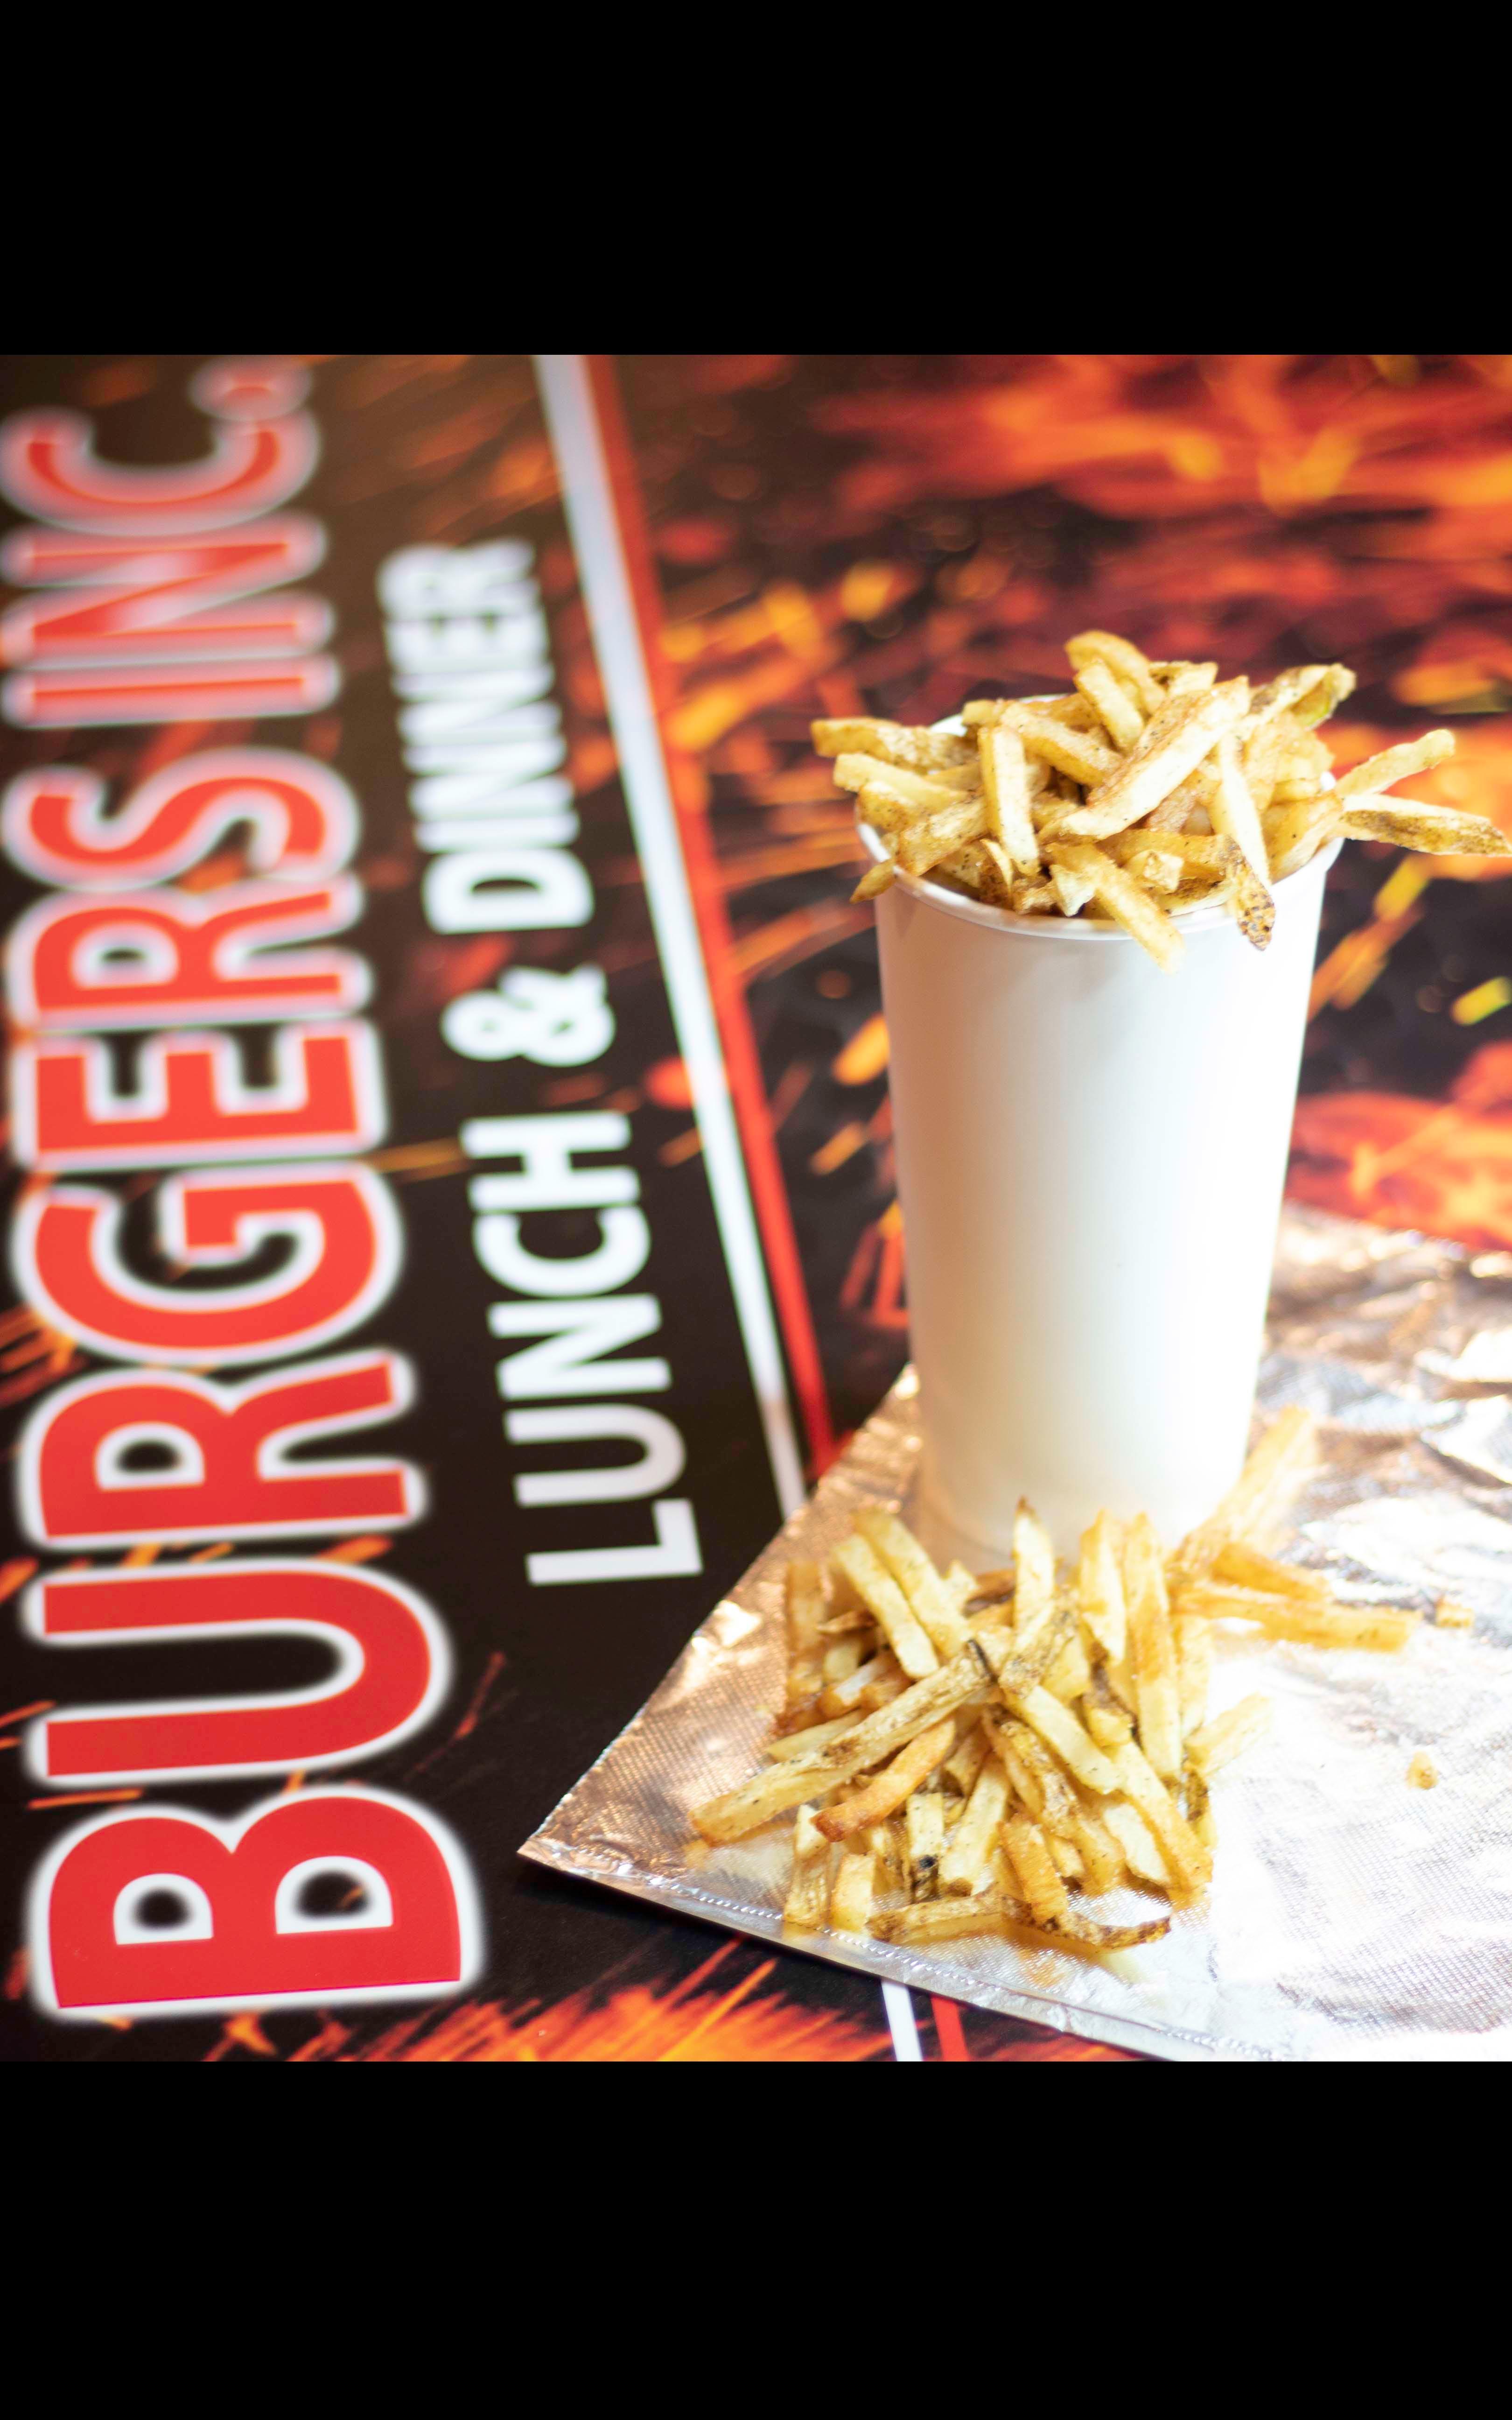 Burgers Inc. image 5